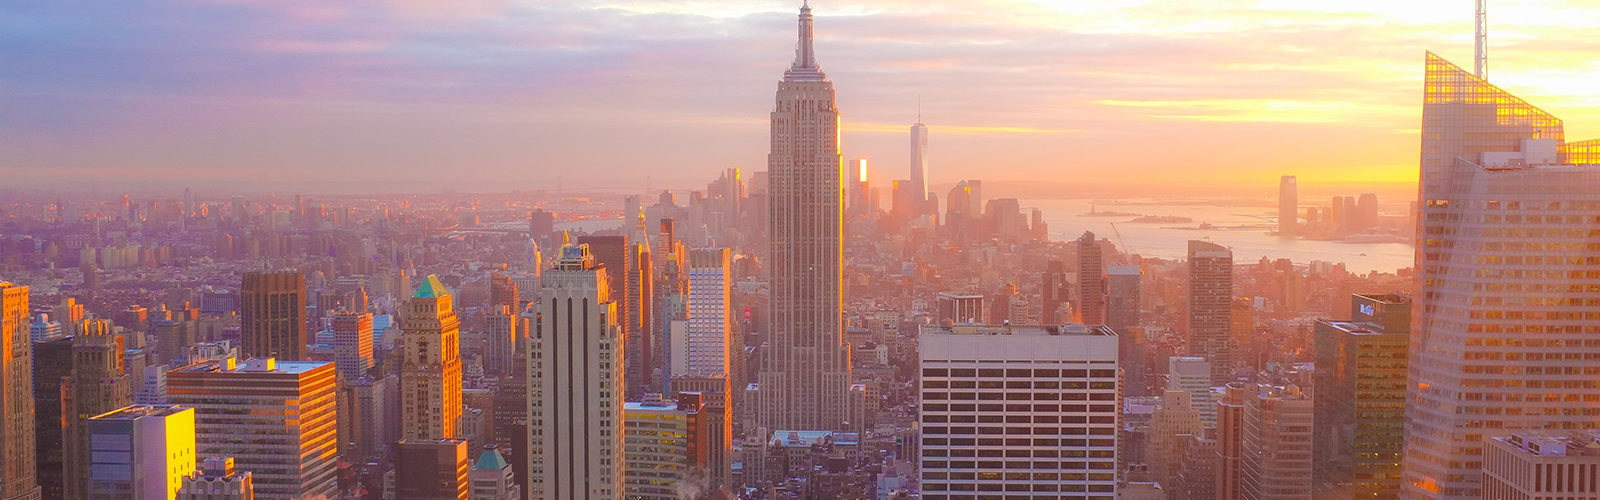 COVER-bien-exception-new-york-manoir-ciel2